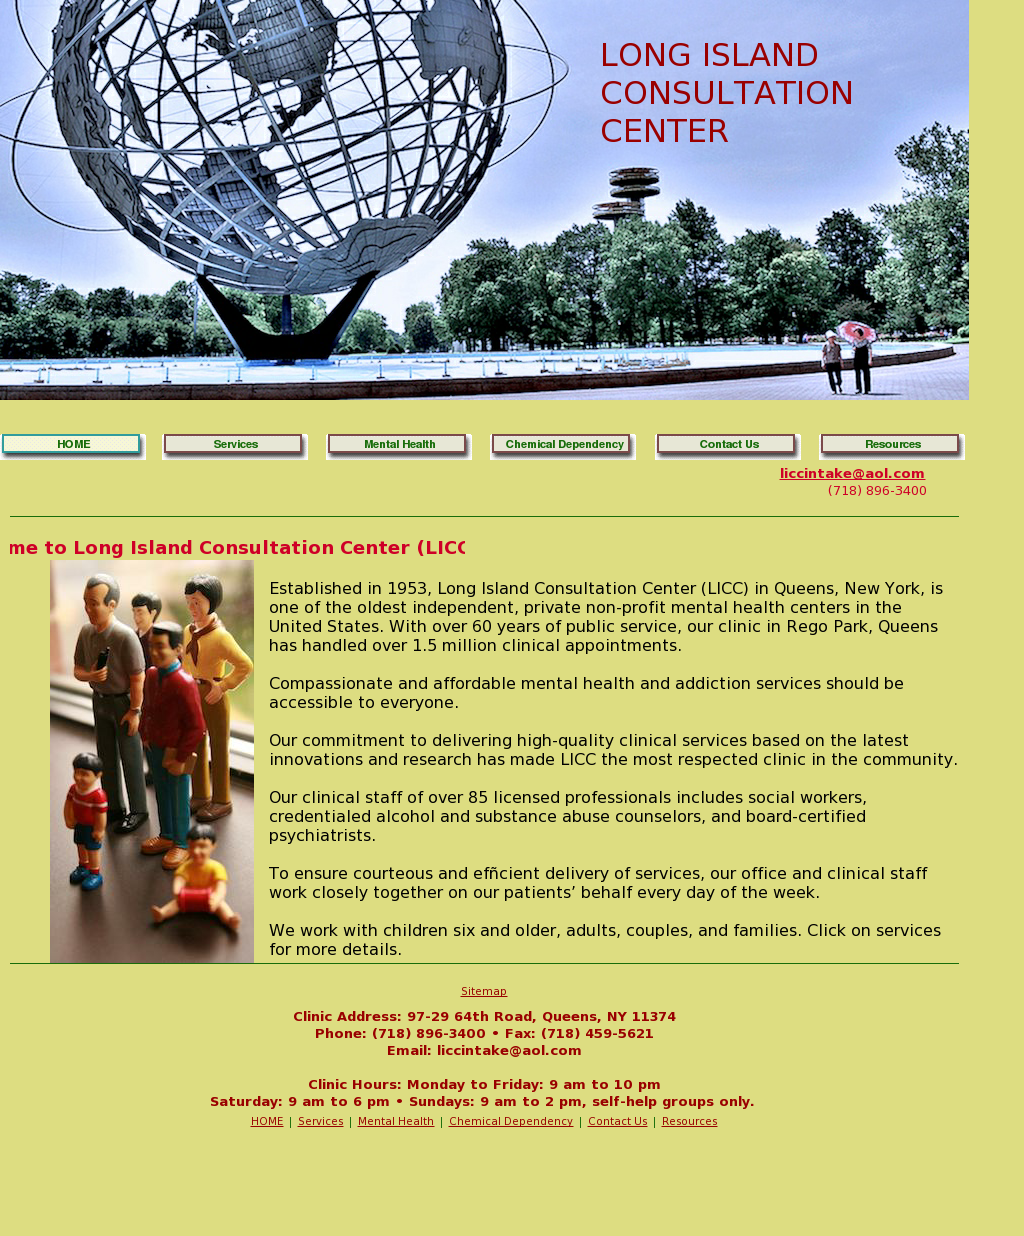 Long Island Consultation Center Competitors, Revenue and